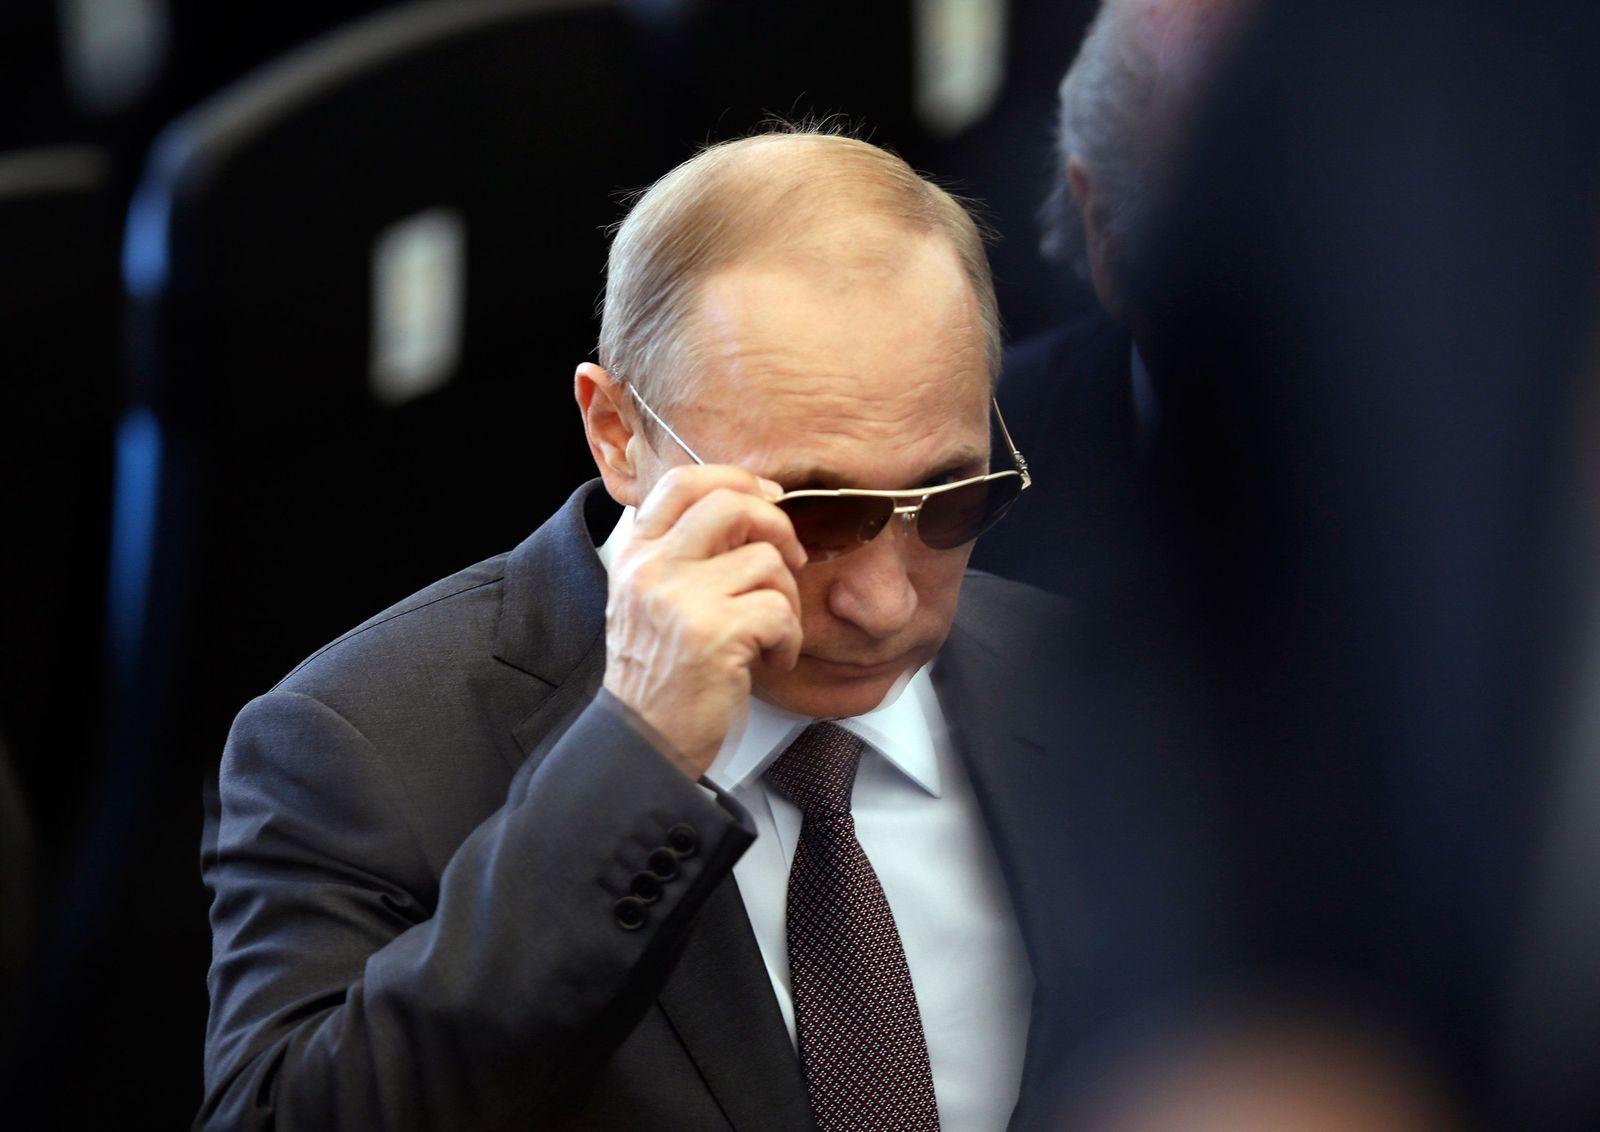 Putin World Cup 2014 - Final - Germany - Argentina